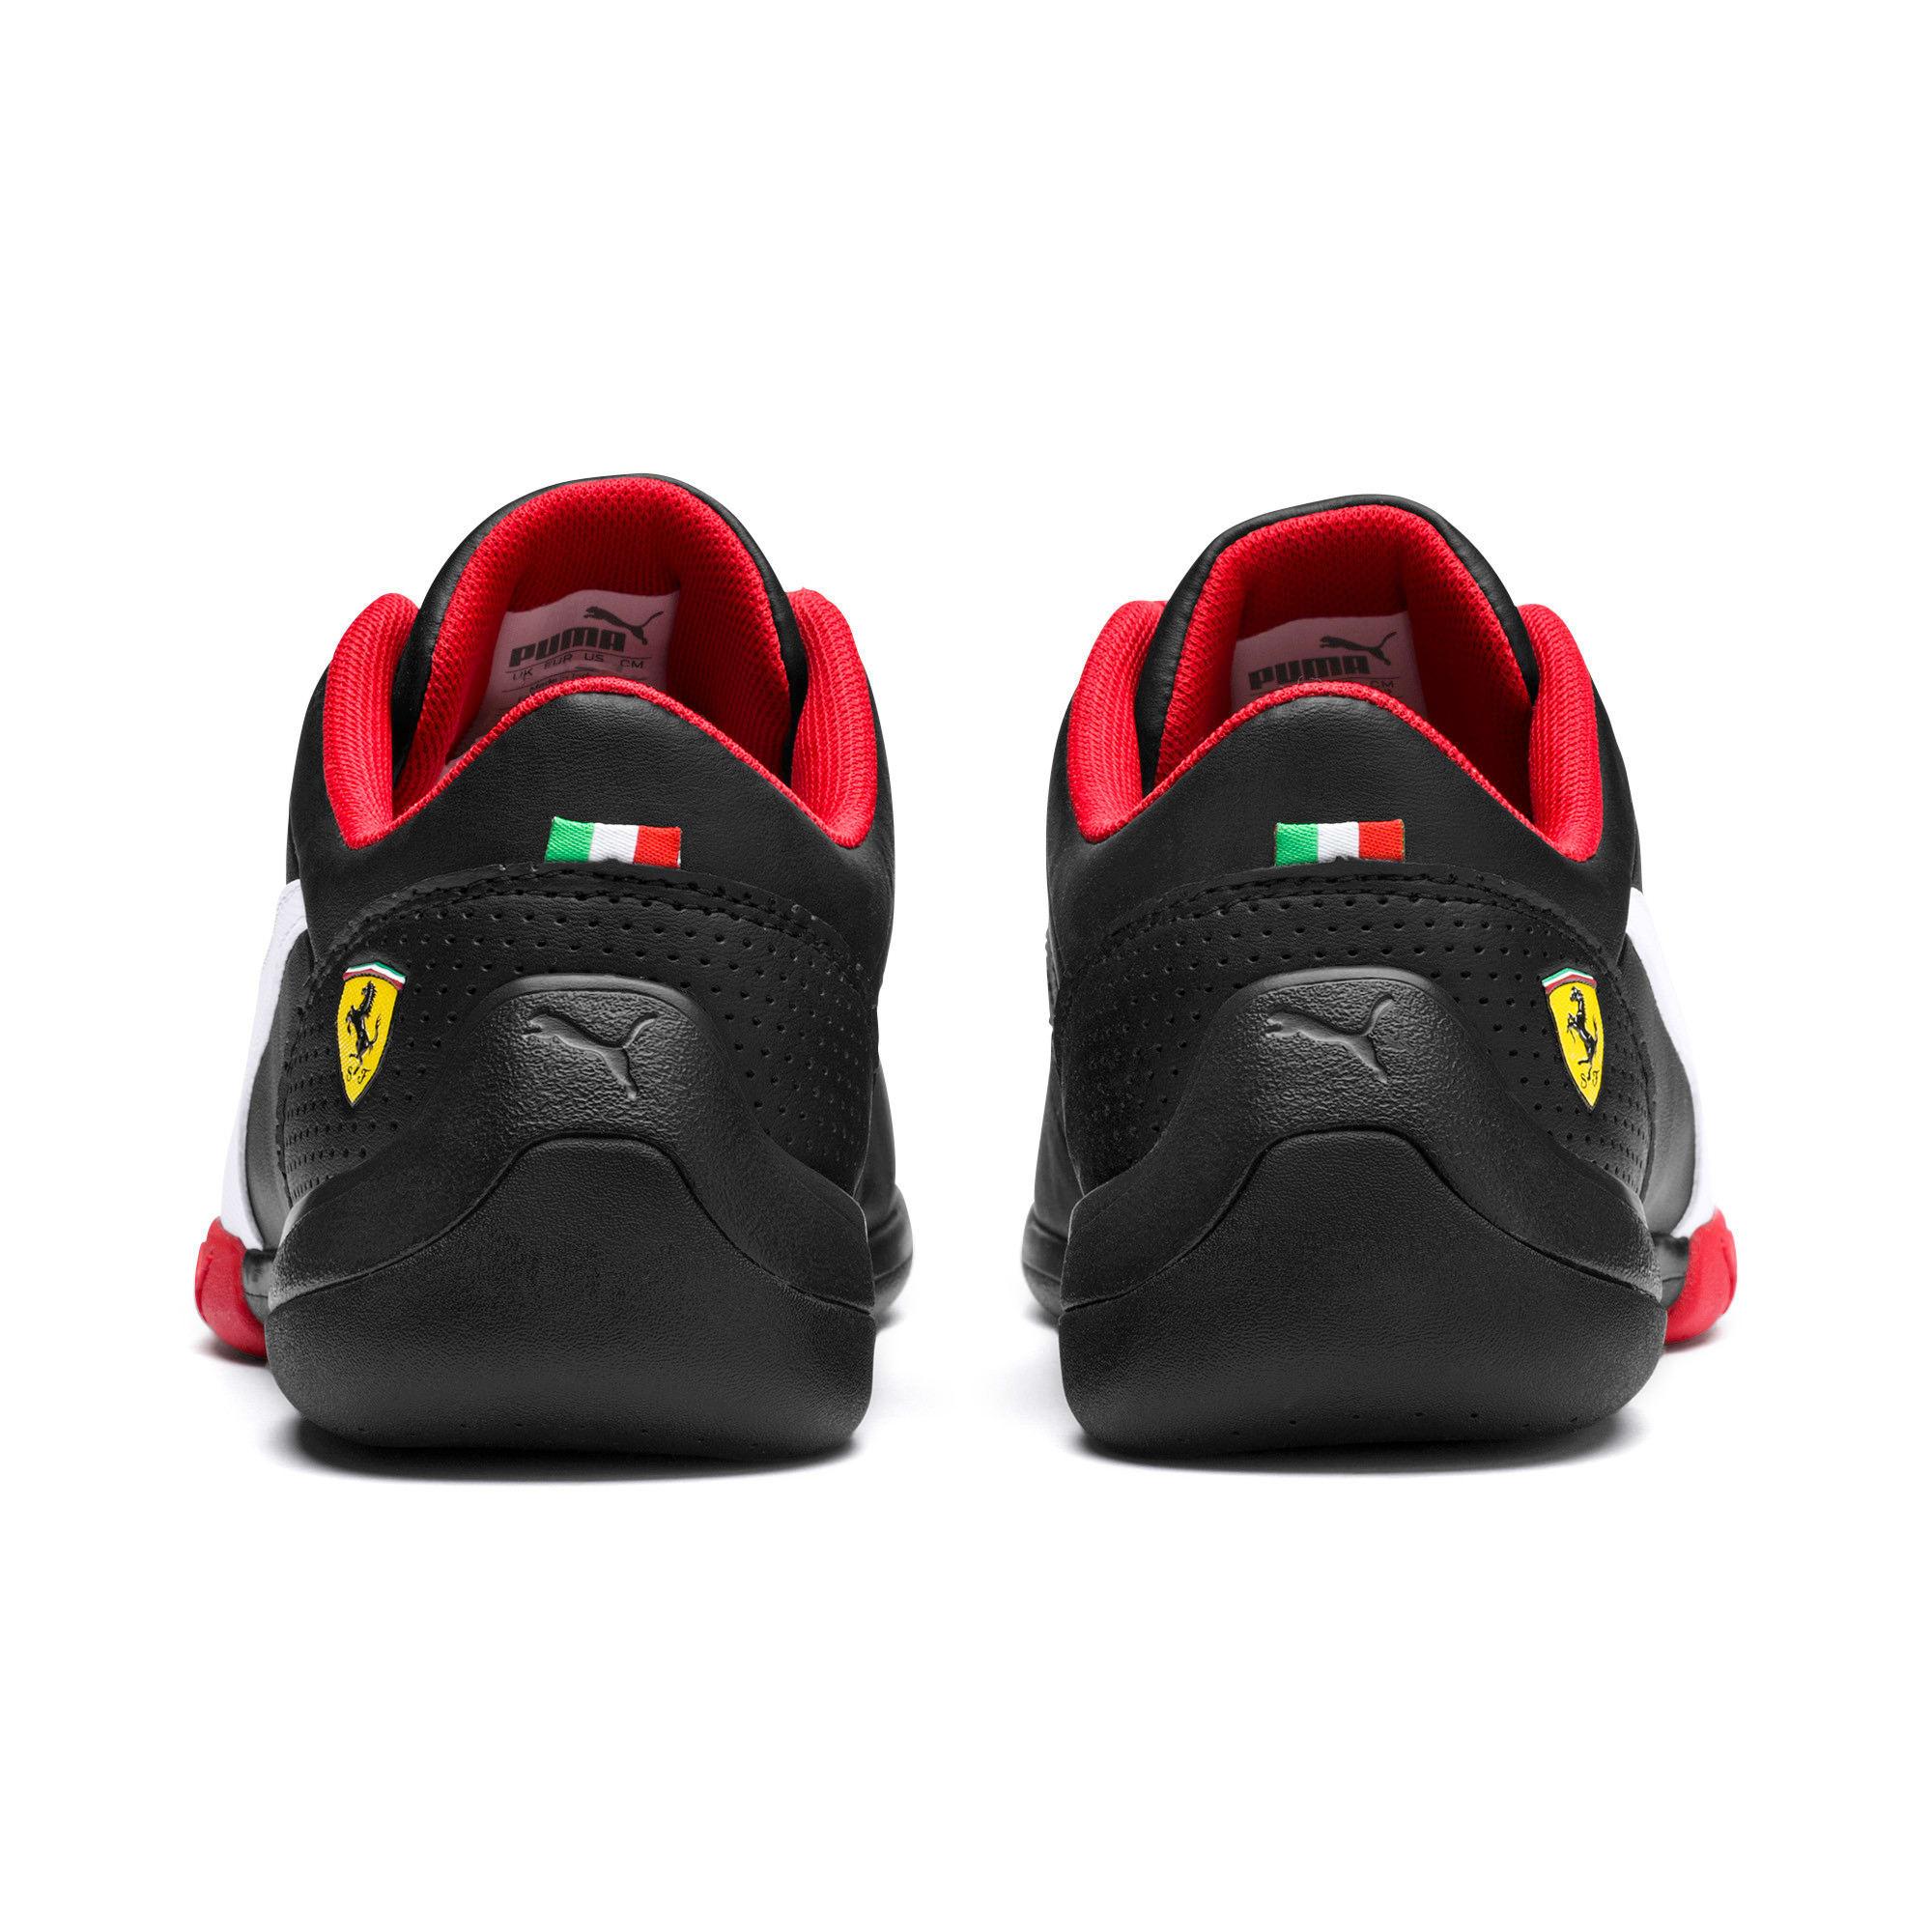 Thumbnail 3 of Scuderia Ferrari Kart Cat III Shoes, Puma Black-Puma White, medium